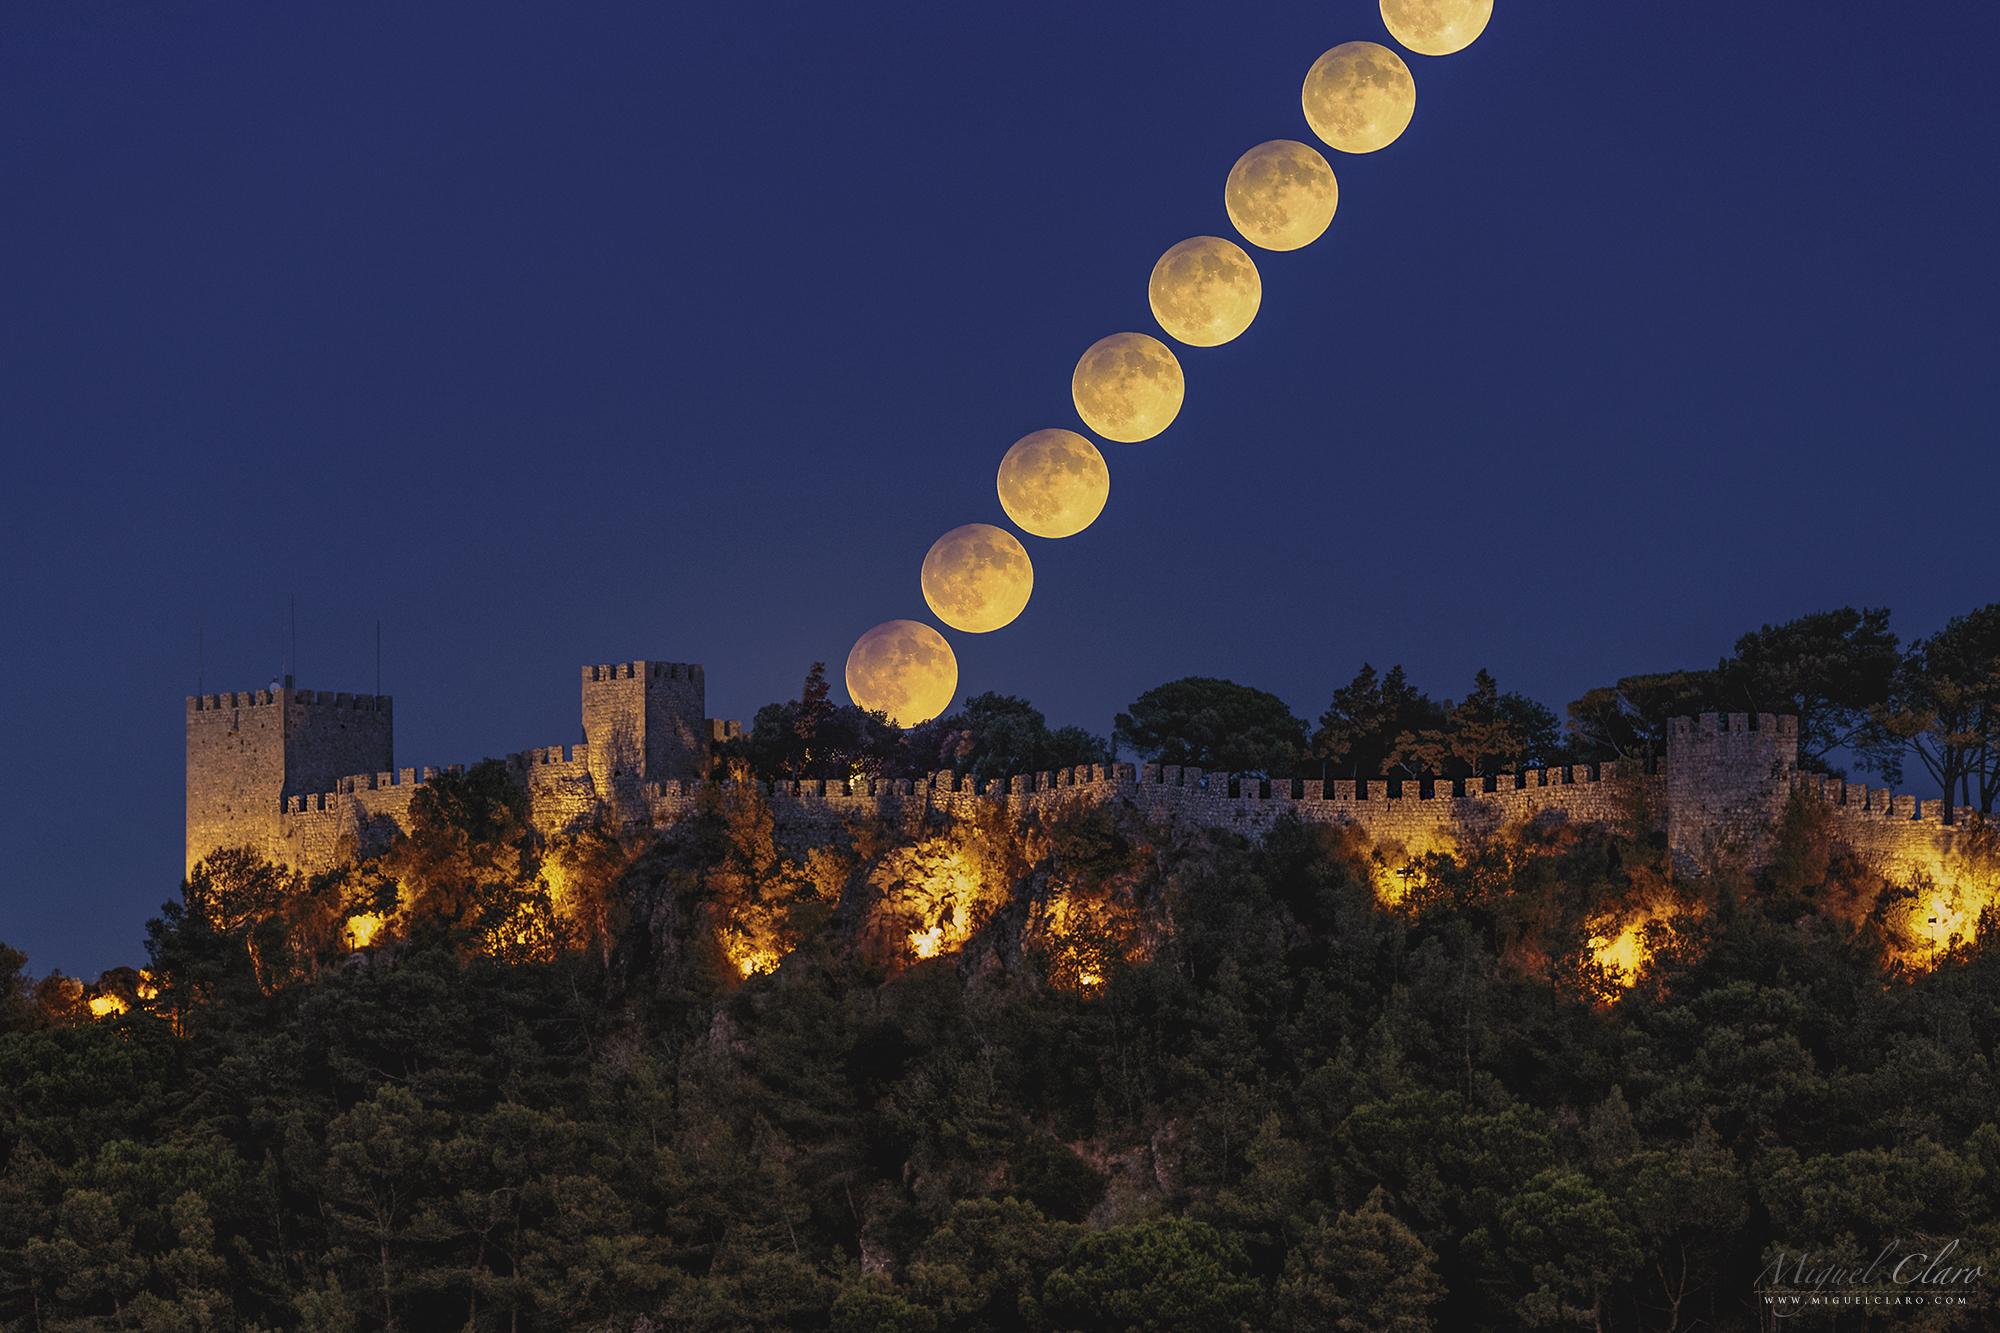 Harvest Moon moonrise over Sesimbra Castle, Portugal